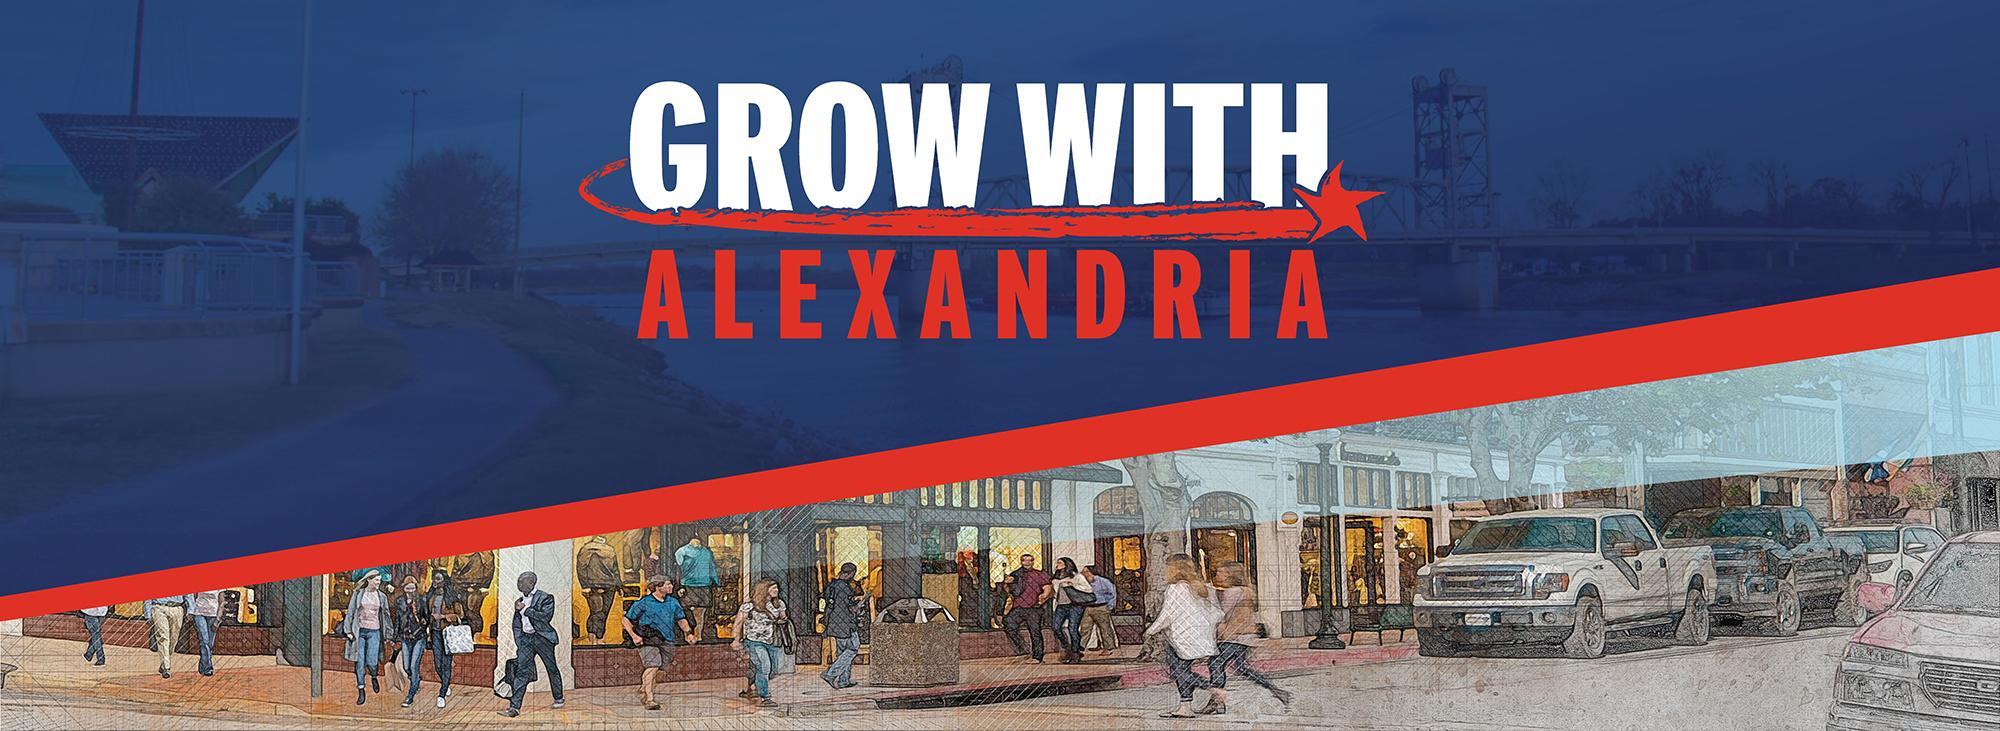 Grow with Alexandria City of Alexandria